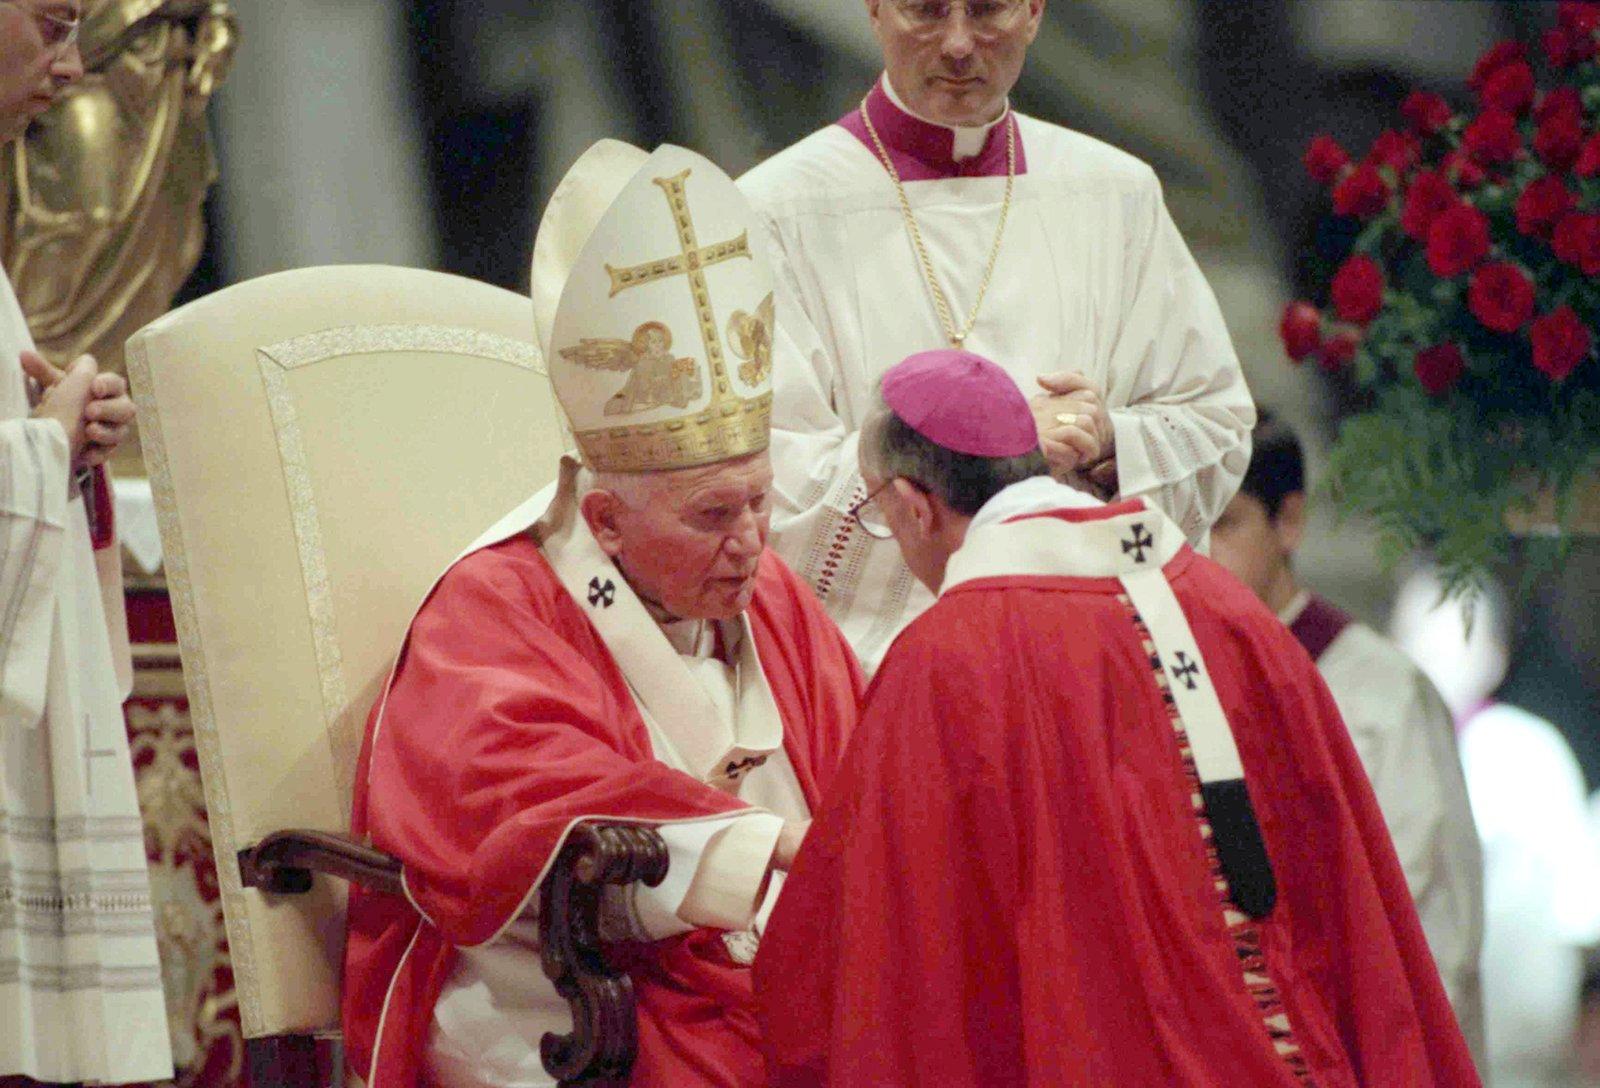 Pope John Paul II greets the archbishop of Buenos Aires, Archbishop Jorge Mario Bergoglio, at the Vatican on June 29, 1998. (AP Photo/Sambucetti)